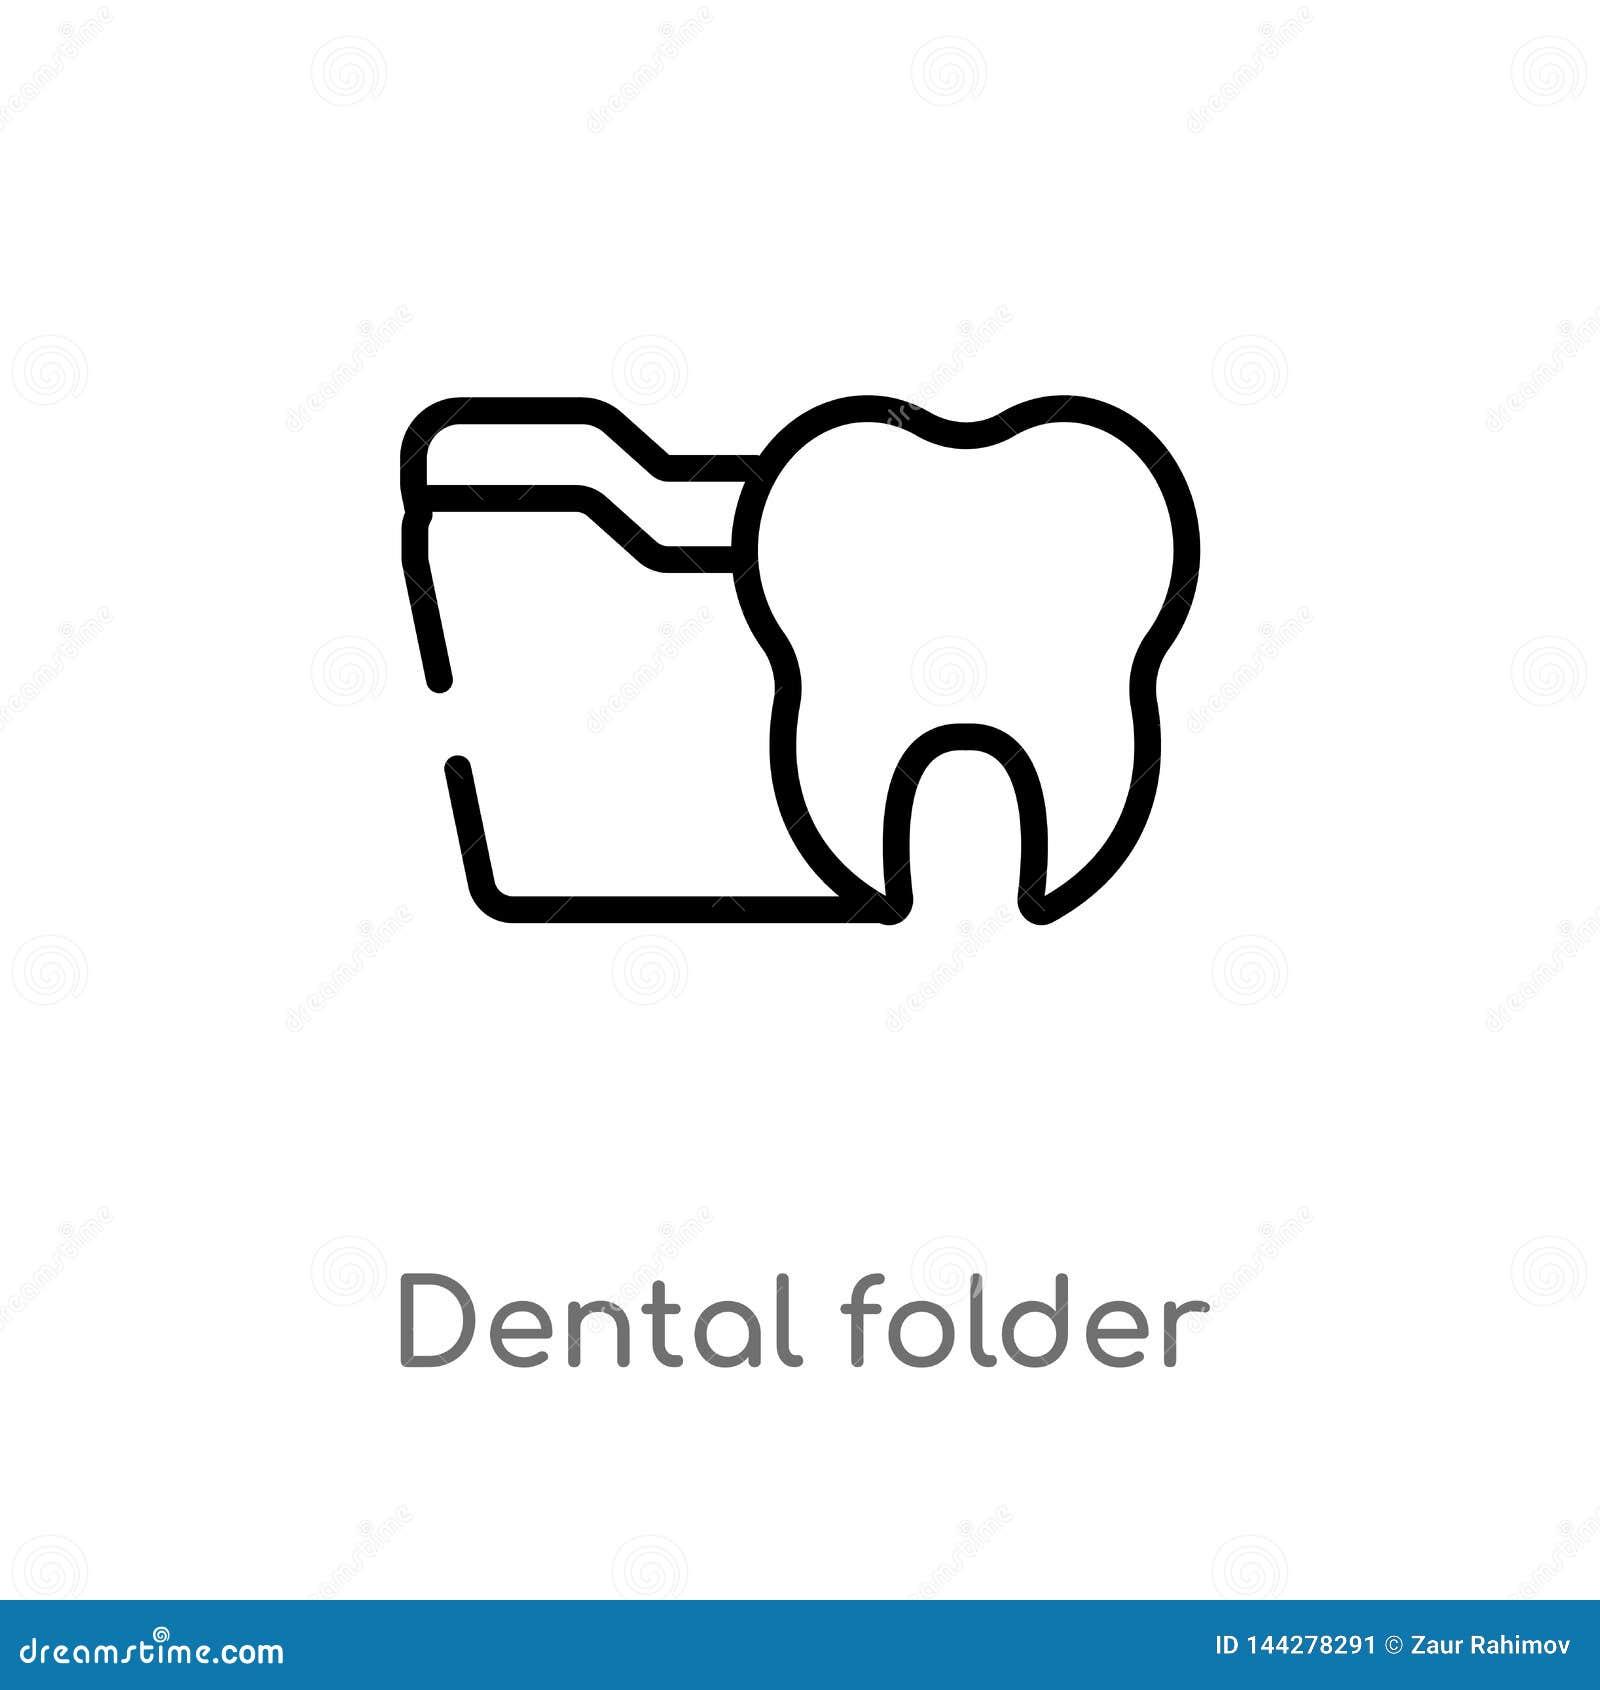 Icono dental del vector de la carpeta del esquema l?nea simple negra aislada ejemplo del elemento del concepto del dentista Movim